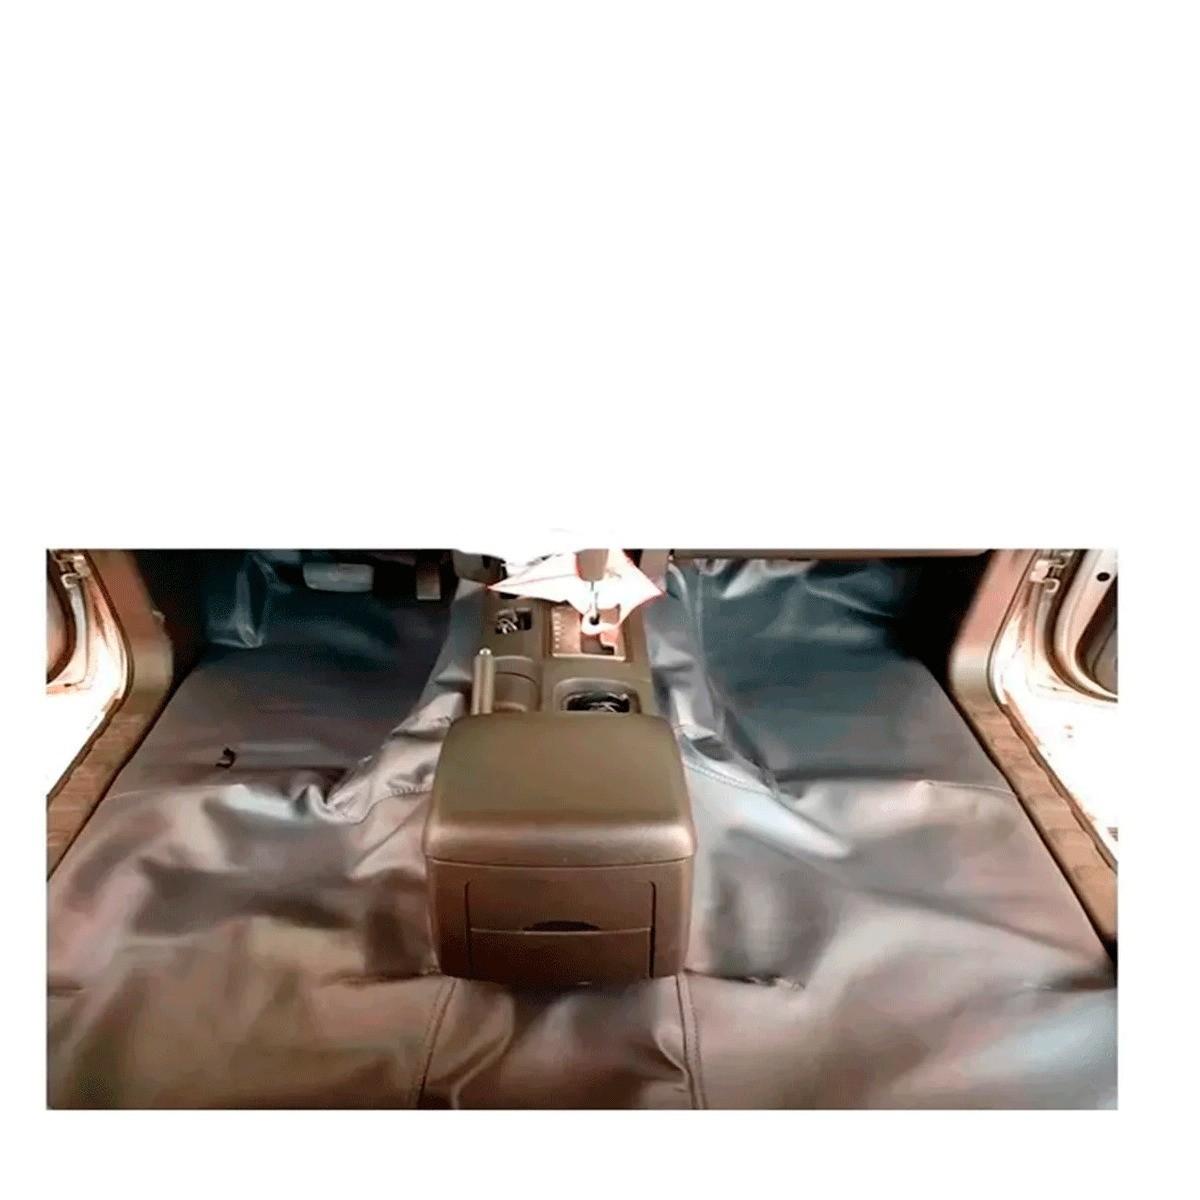 Tapete Automotivo Assoalho Emborrachado Bidim Ford Ká 2006 a 2007